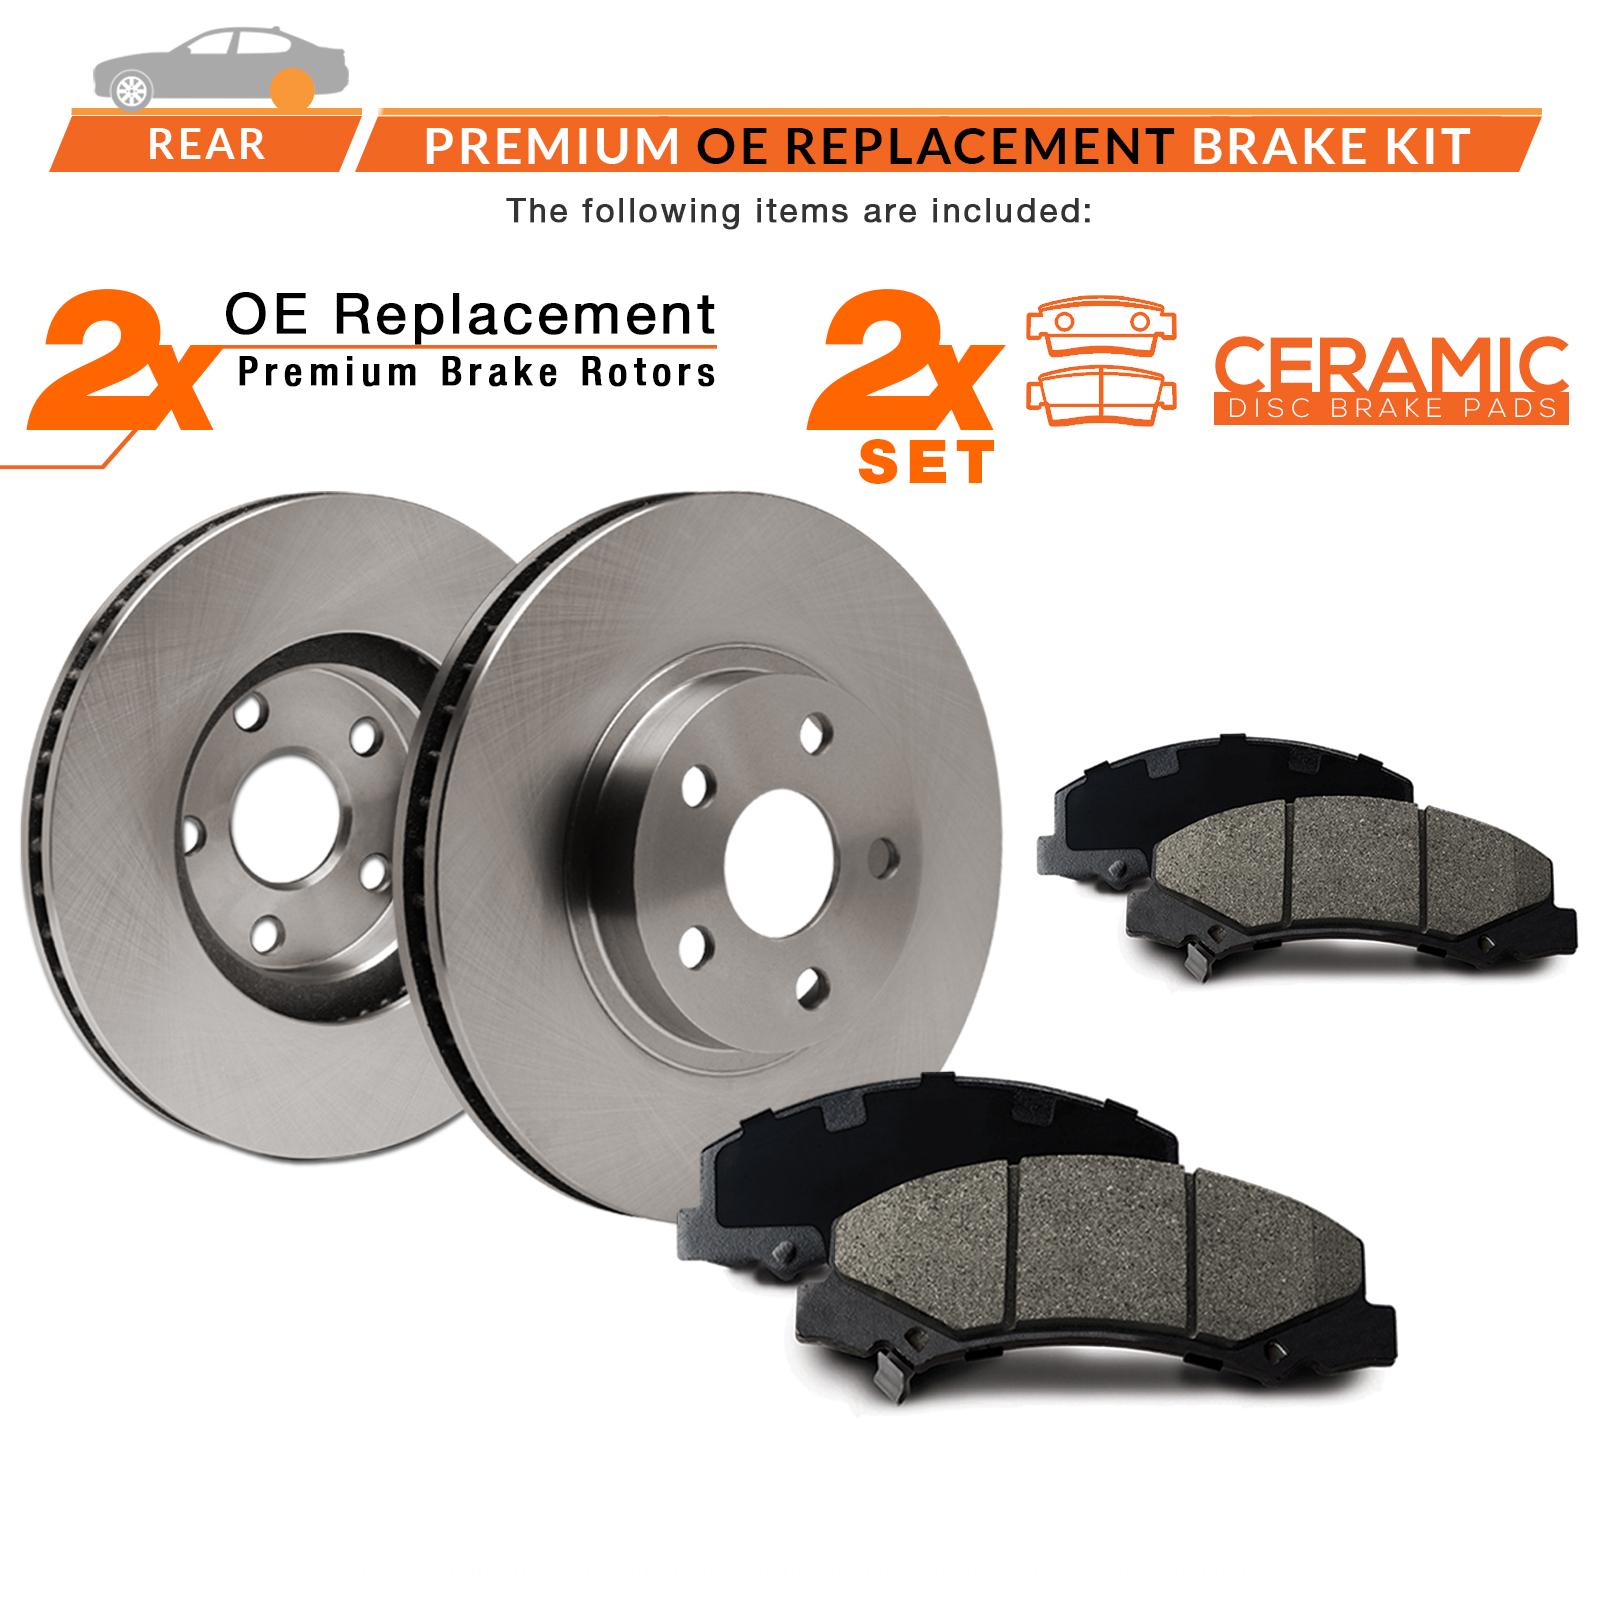 Max Brakes Front /& Rear Premium OE Rotors and Ceramic Pads Brake Kit KT171543-1